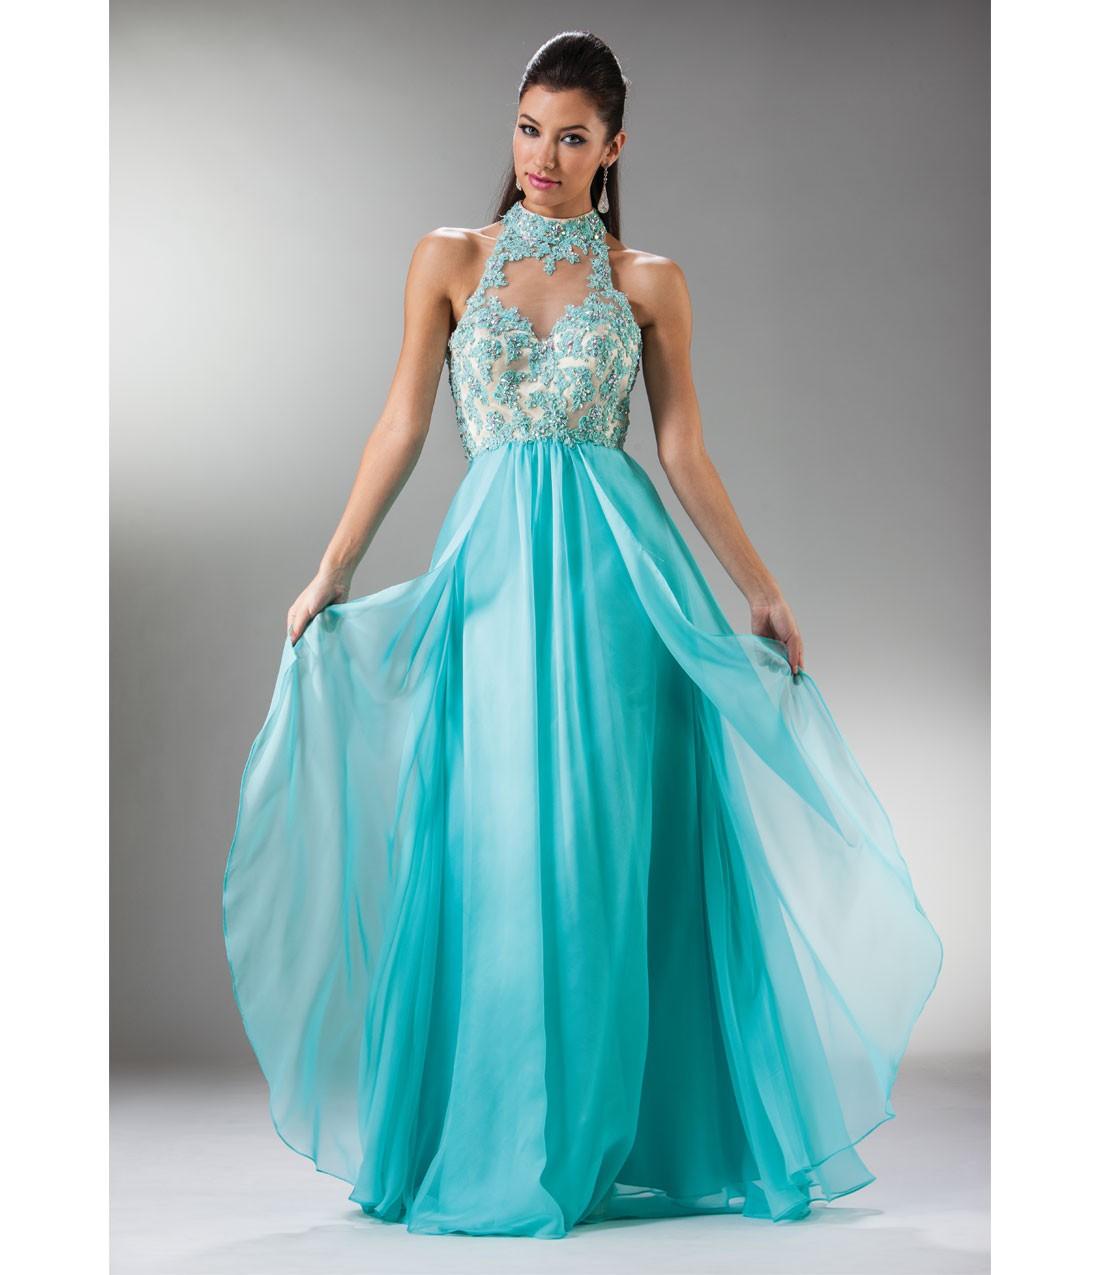 Aqua_Chiffon_Embellished_Collared_Gown